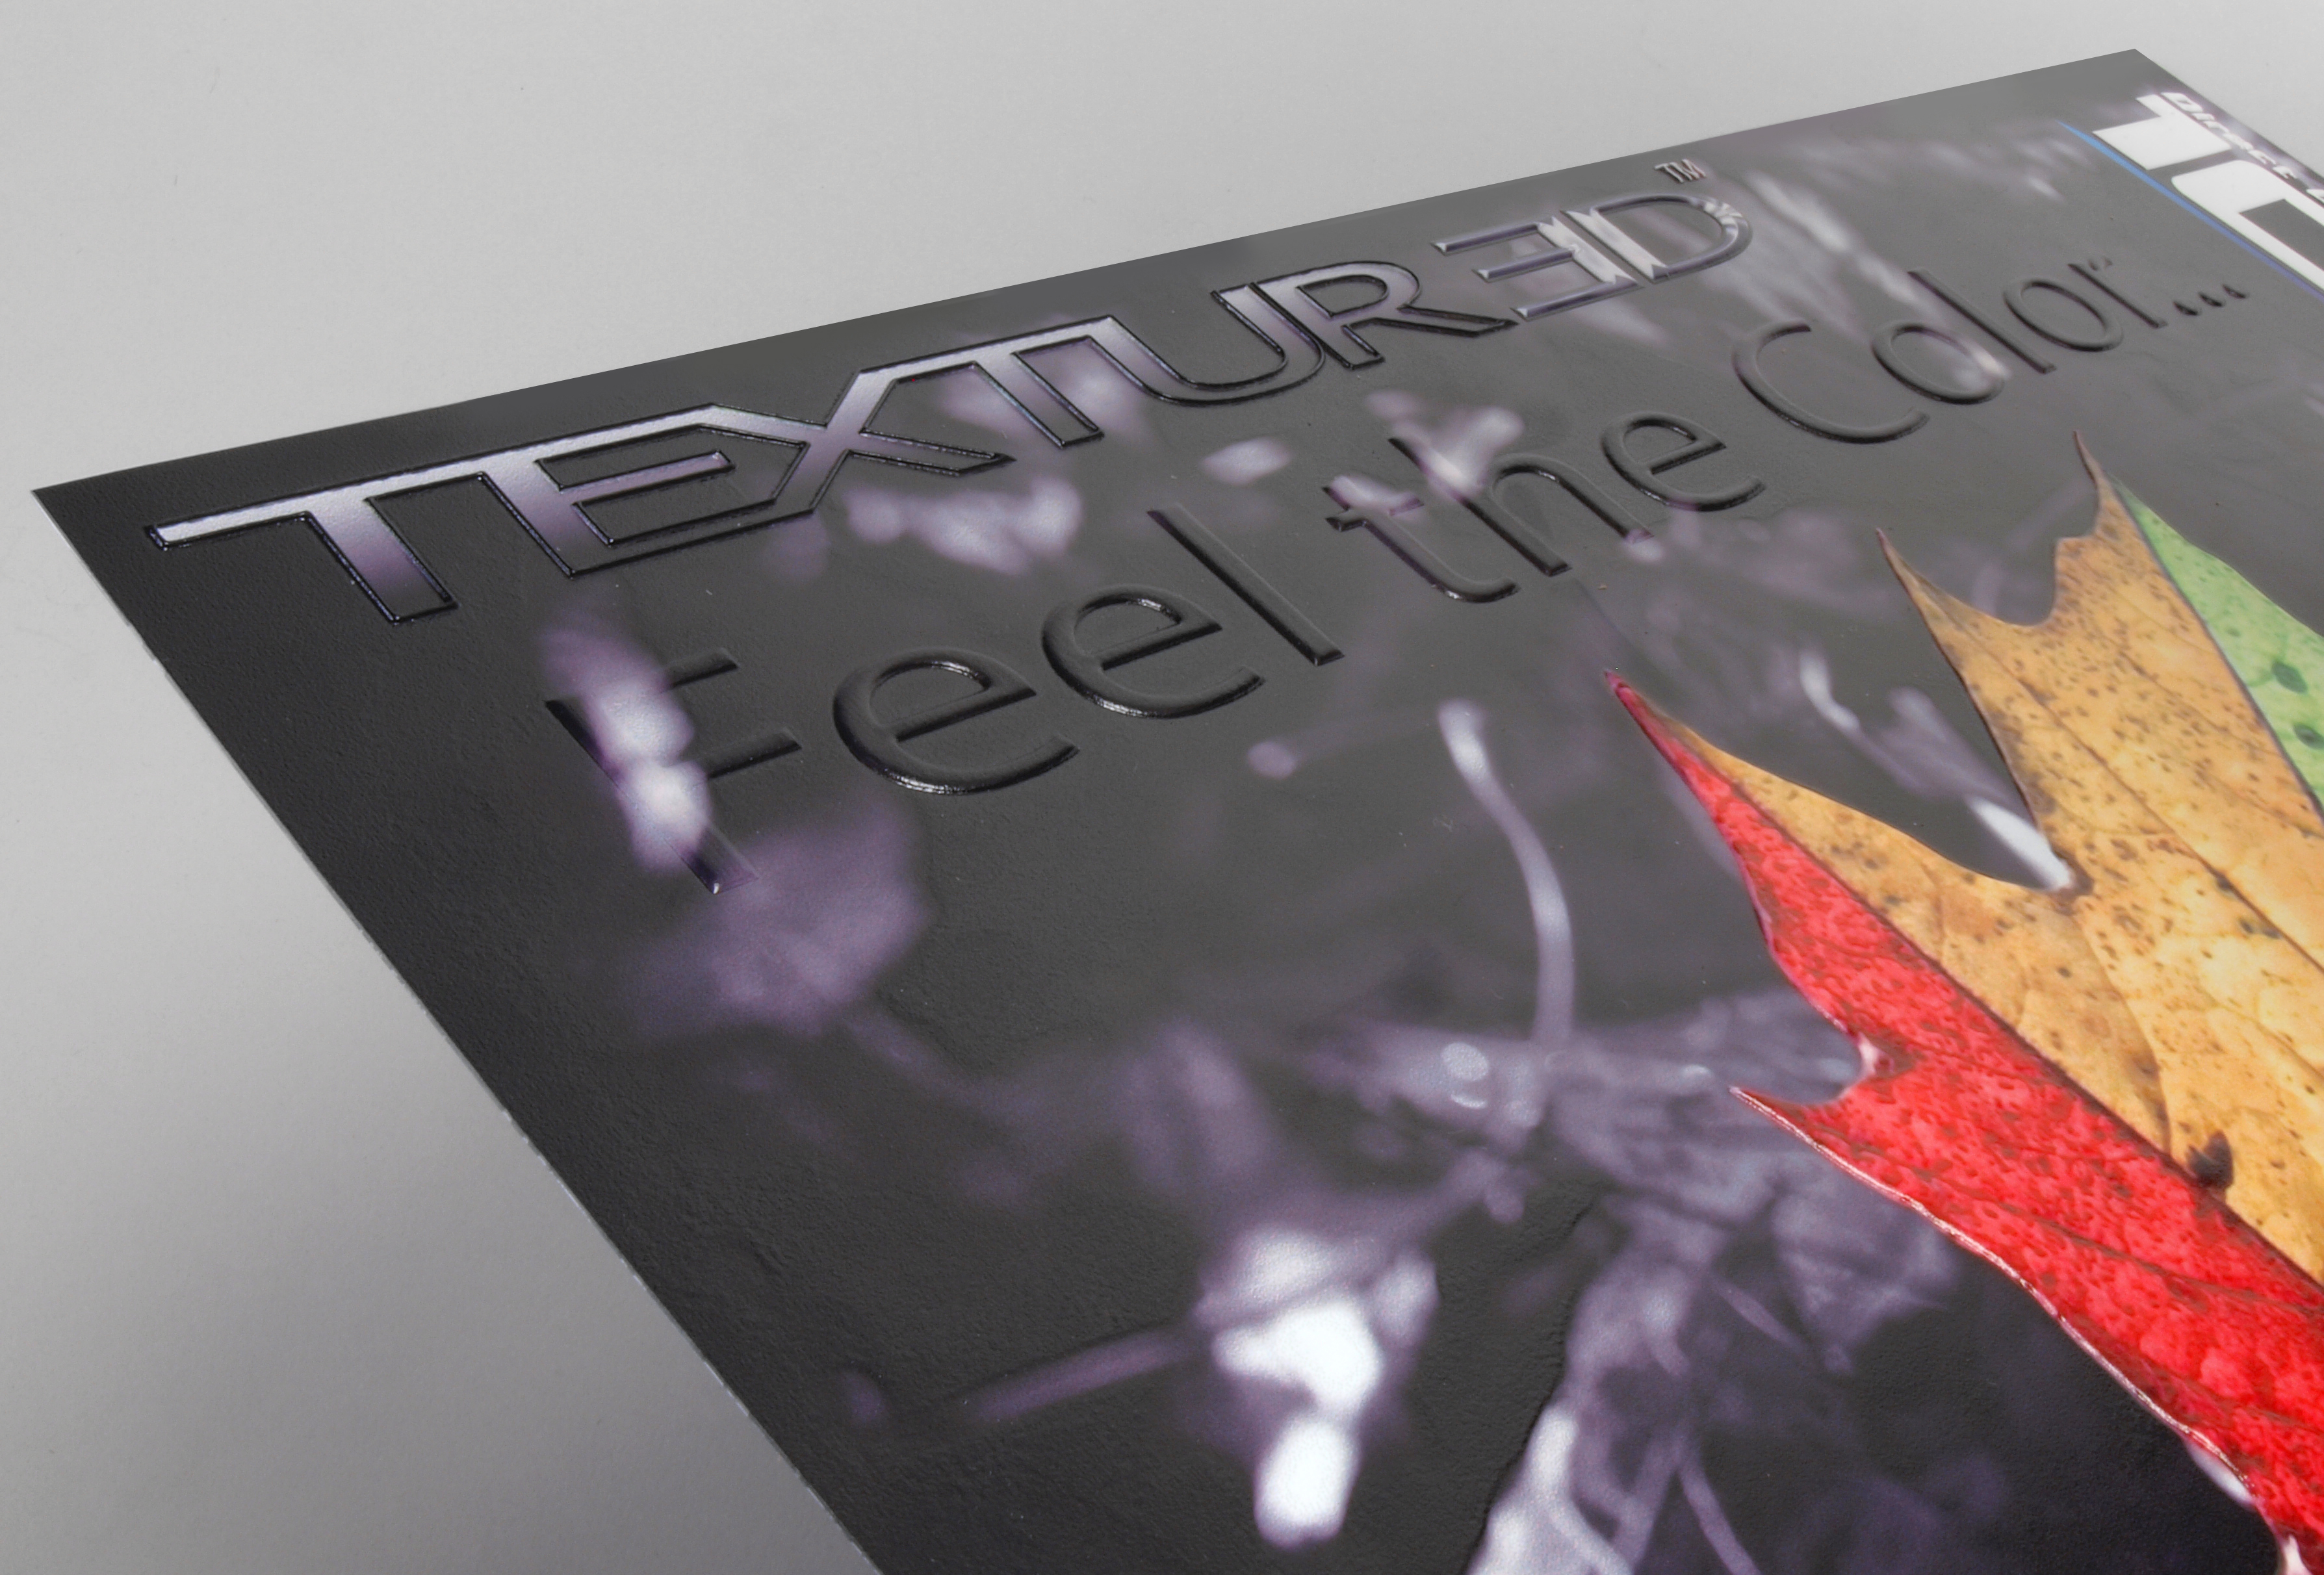 Textur3d Uv Led Inkjet Printers Textured Printing